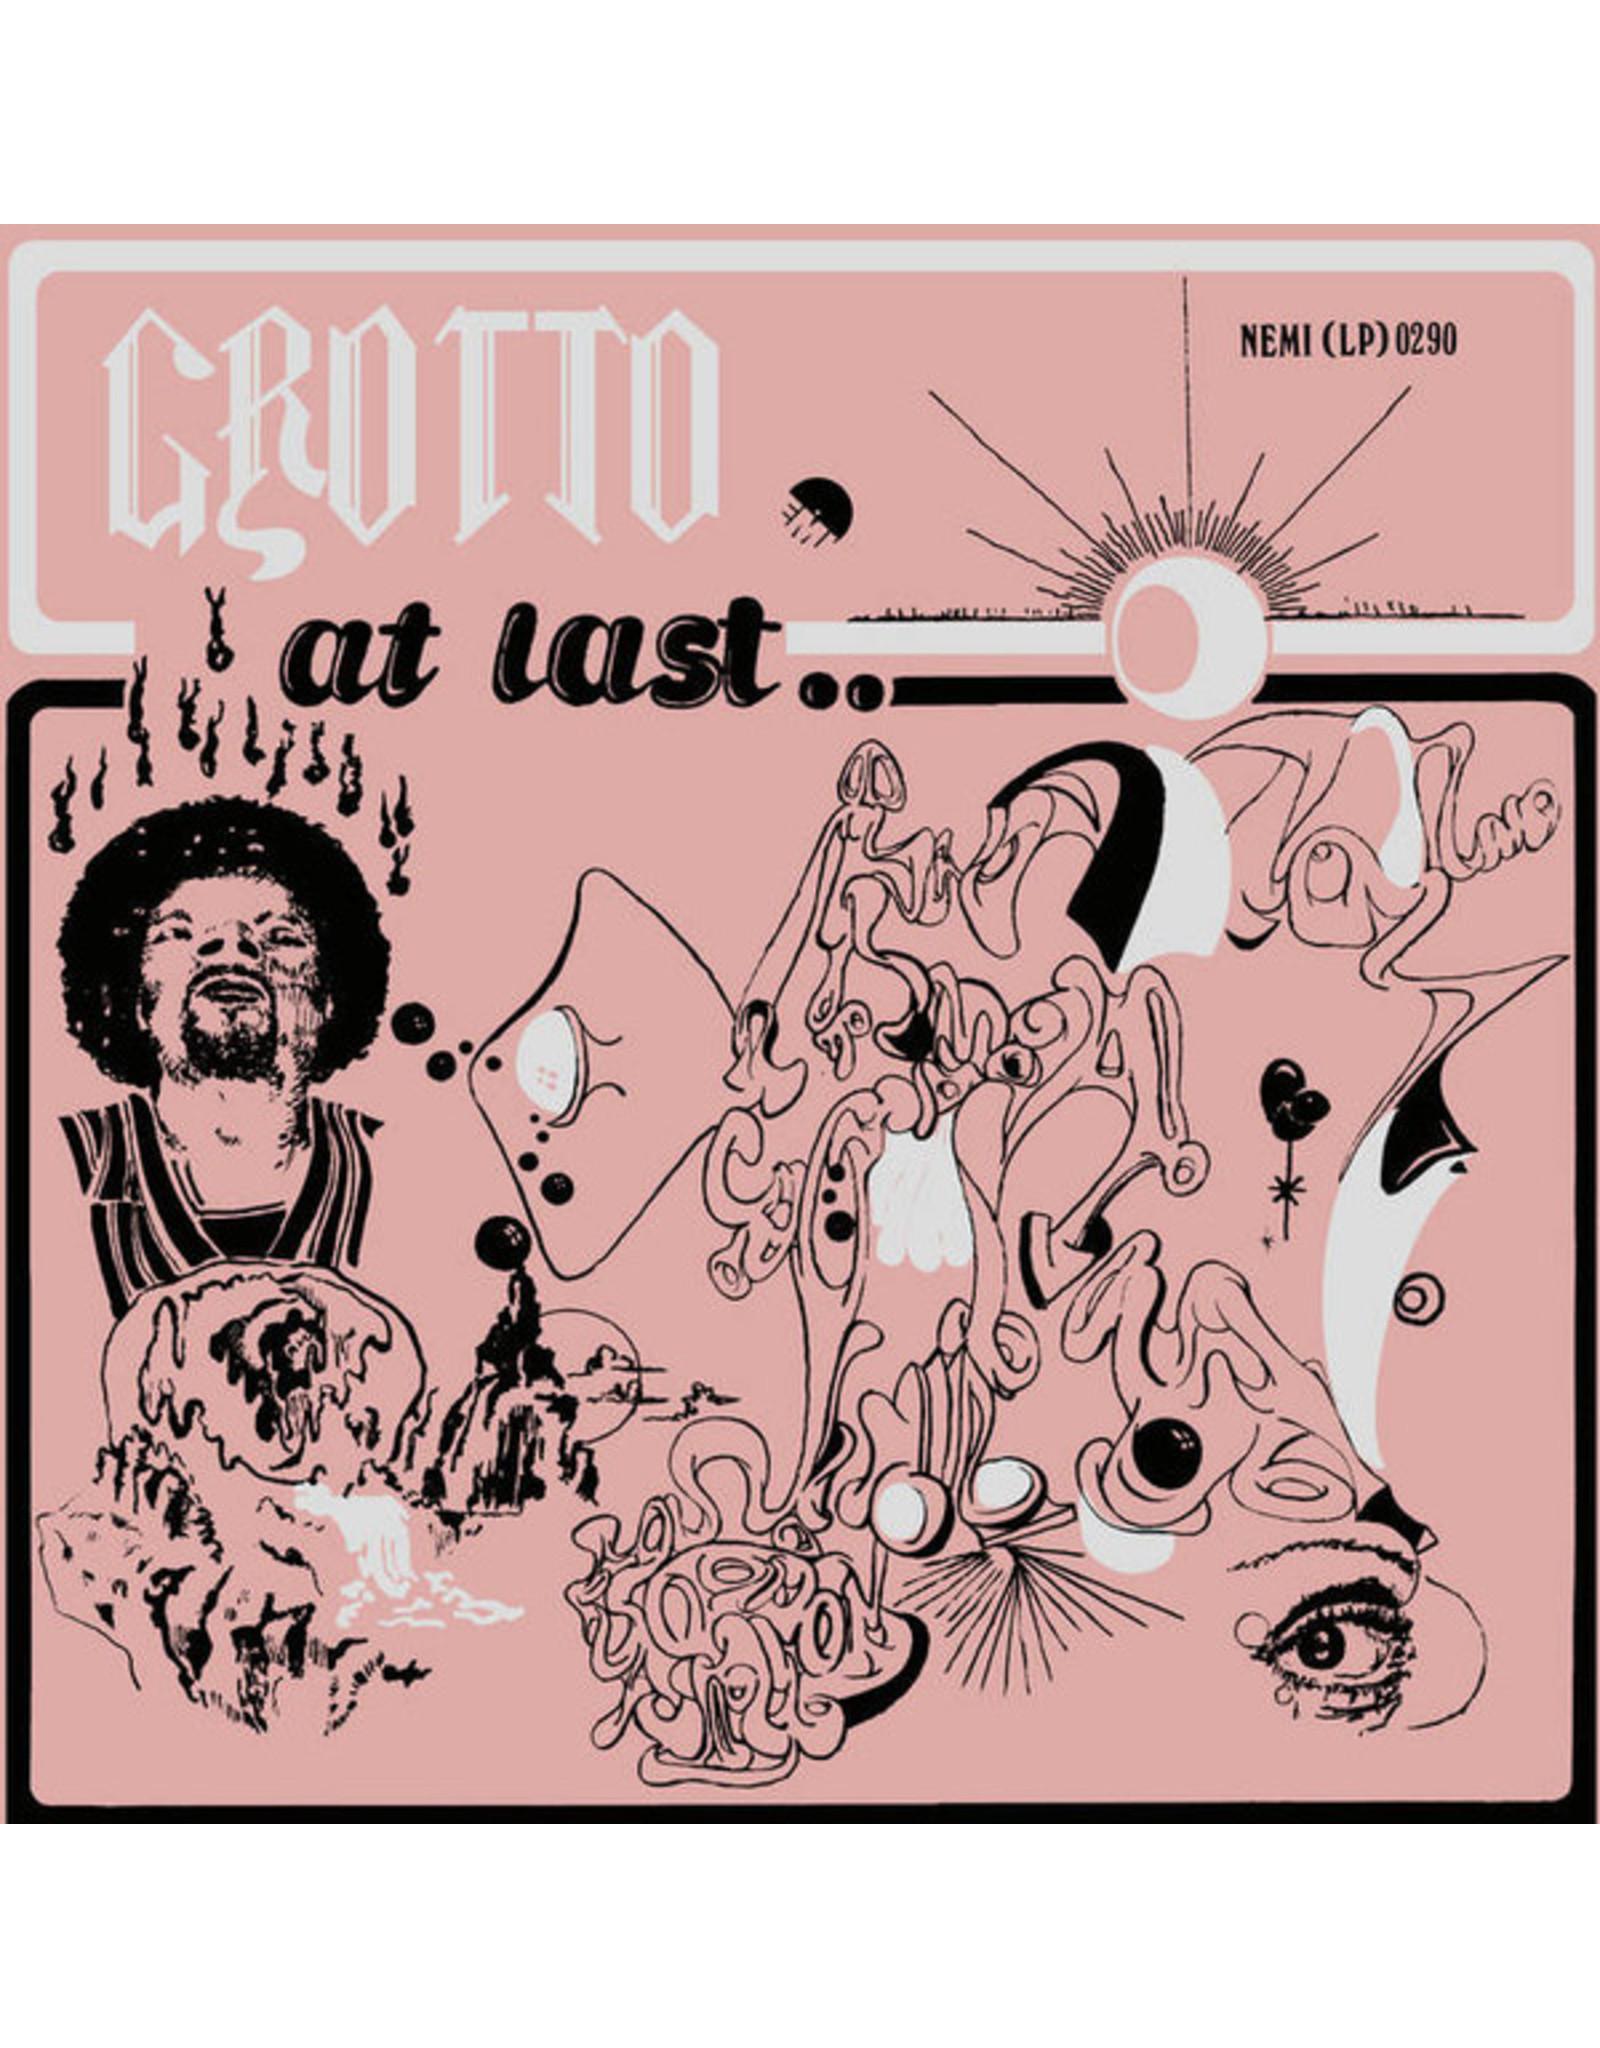 New Vinyl Grotto - At Last LP